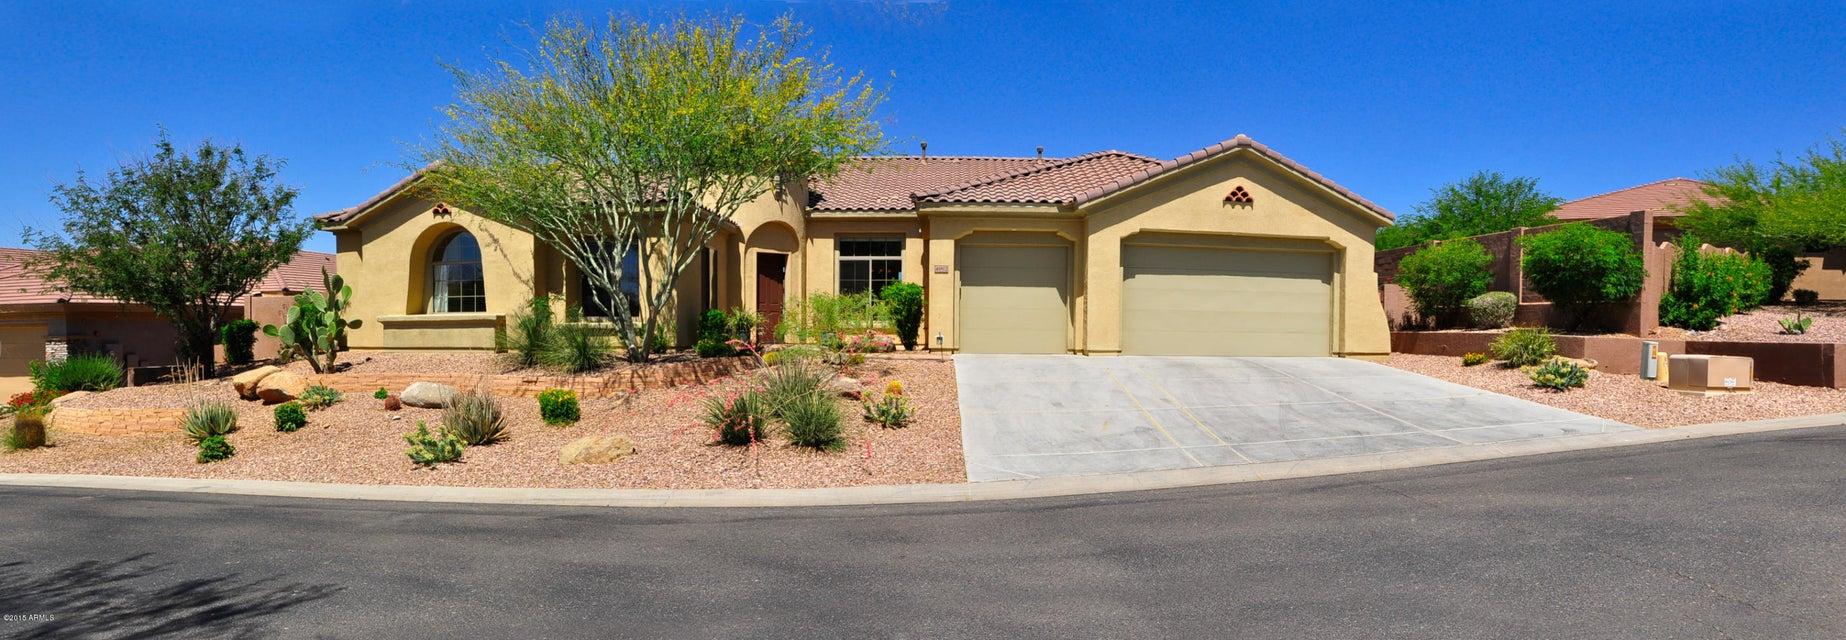 MLS 5753041 41812 N LA CANTERA Drive, Anthem, AZ 85086 Anthem Homes for Rent